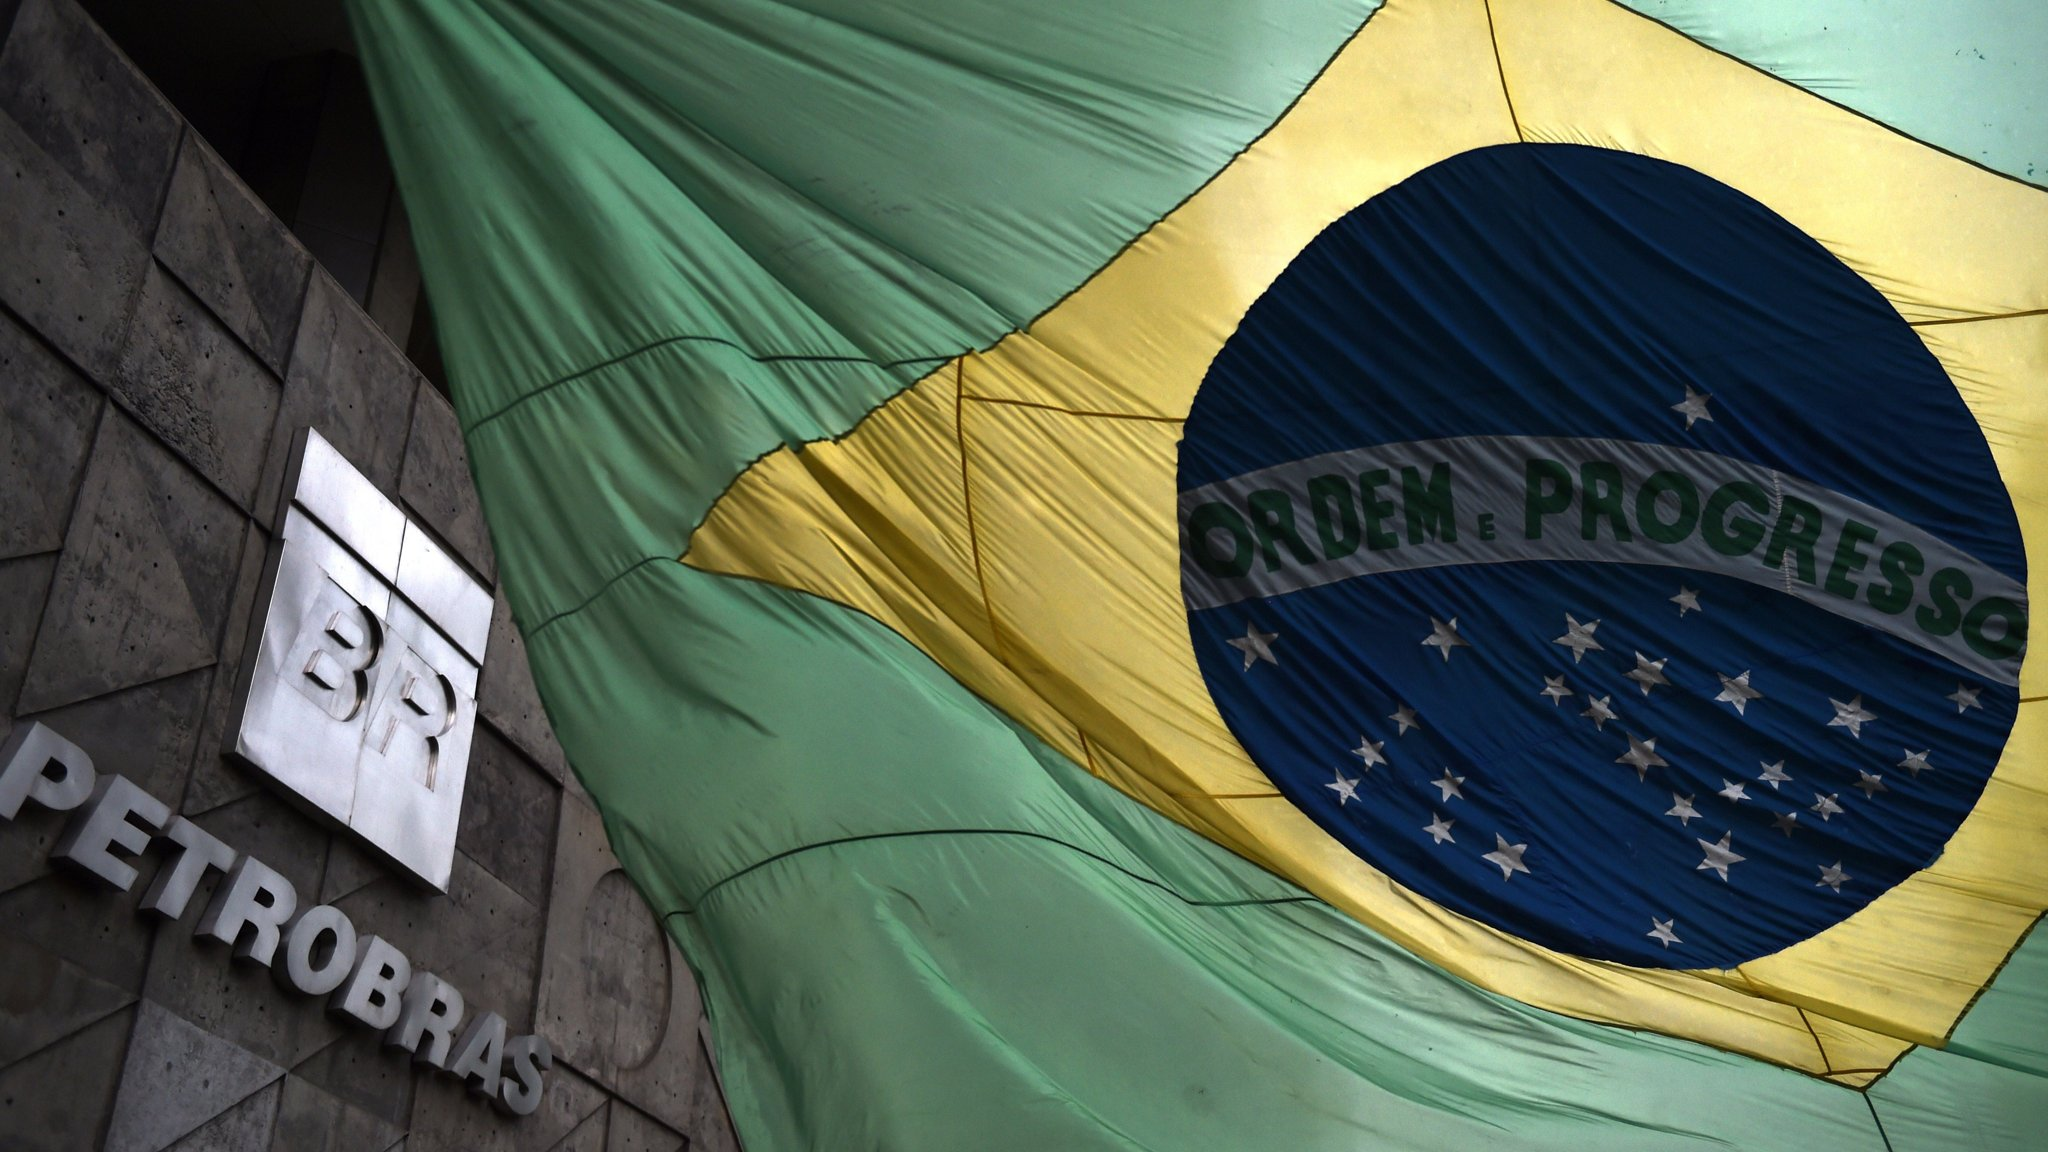 Petrobras scandal highlights need for deep reform in Brazil